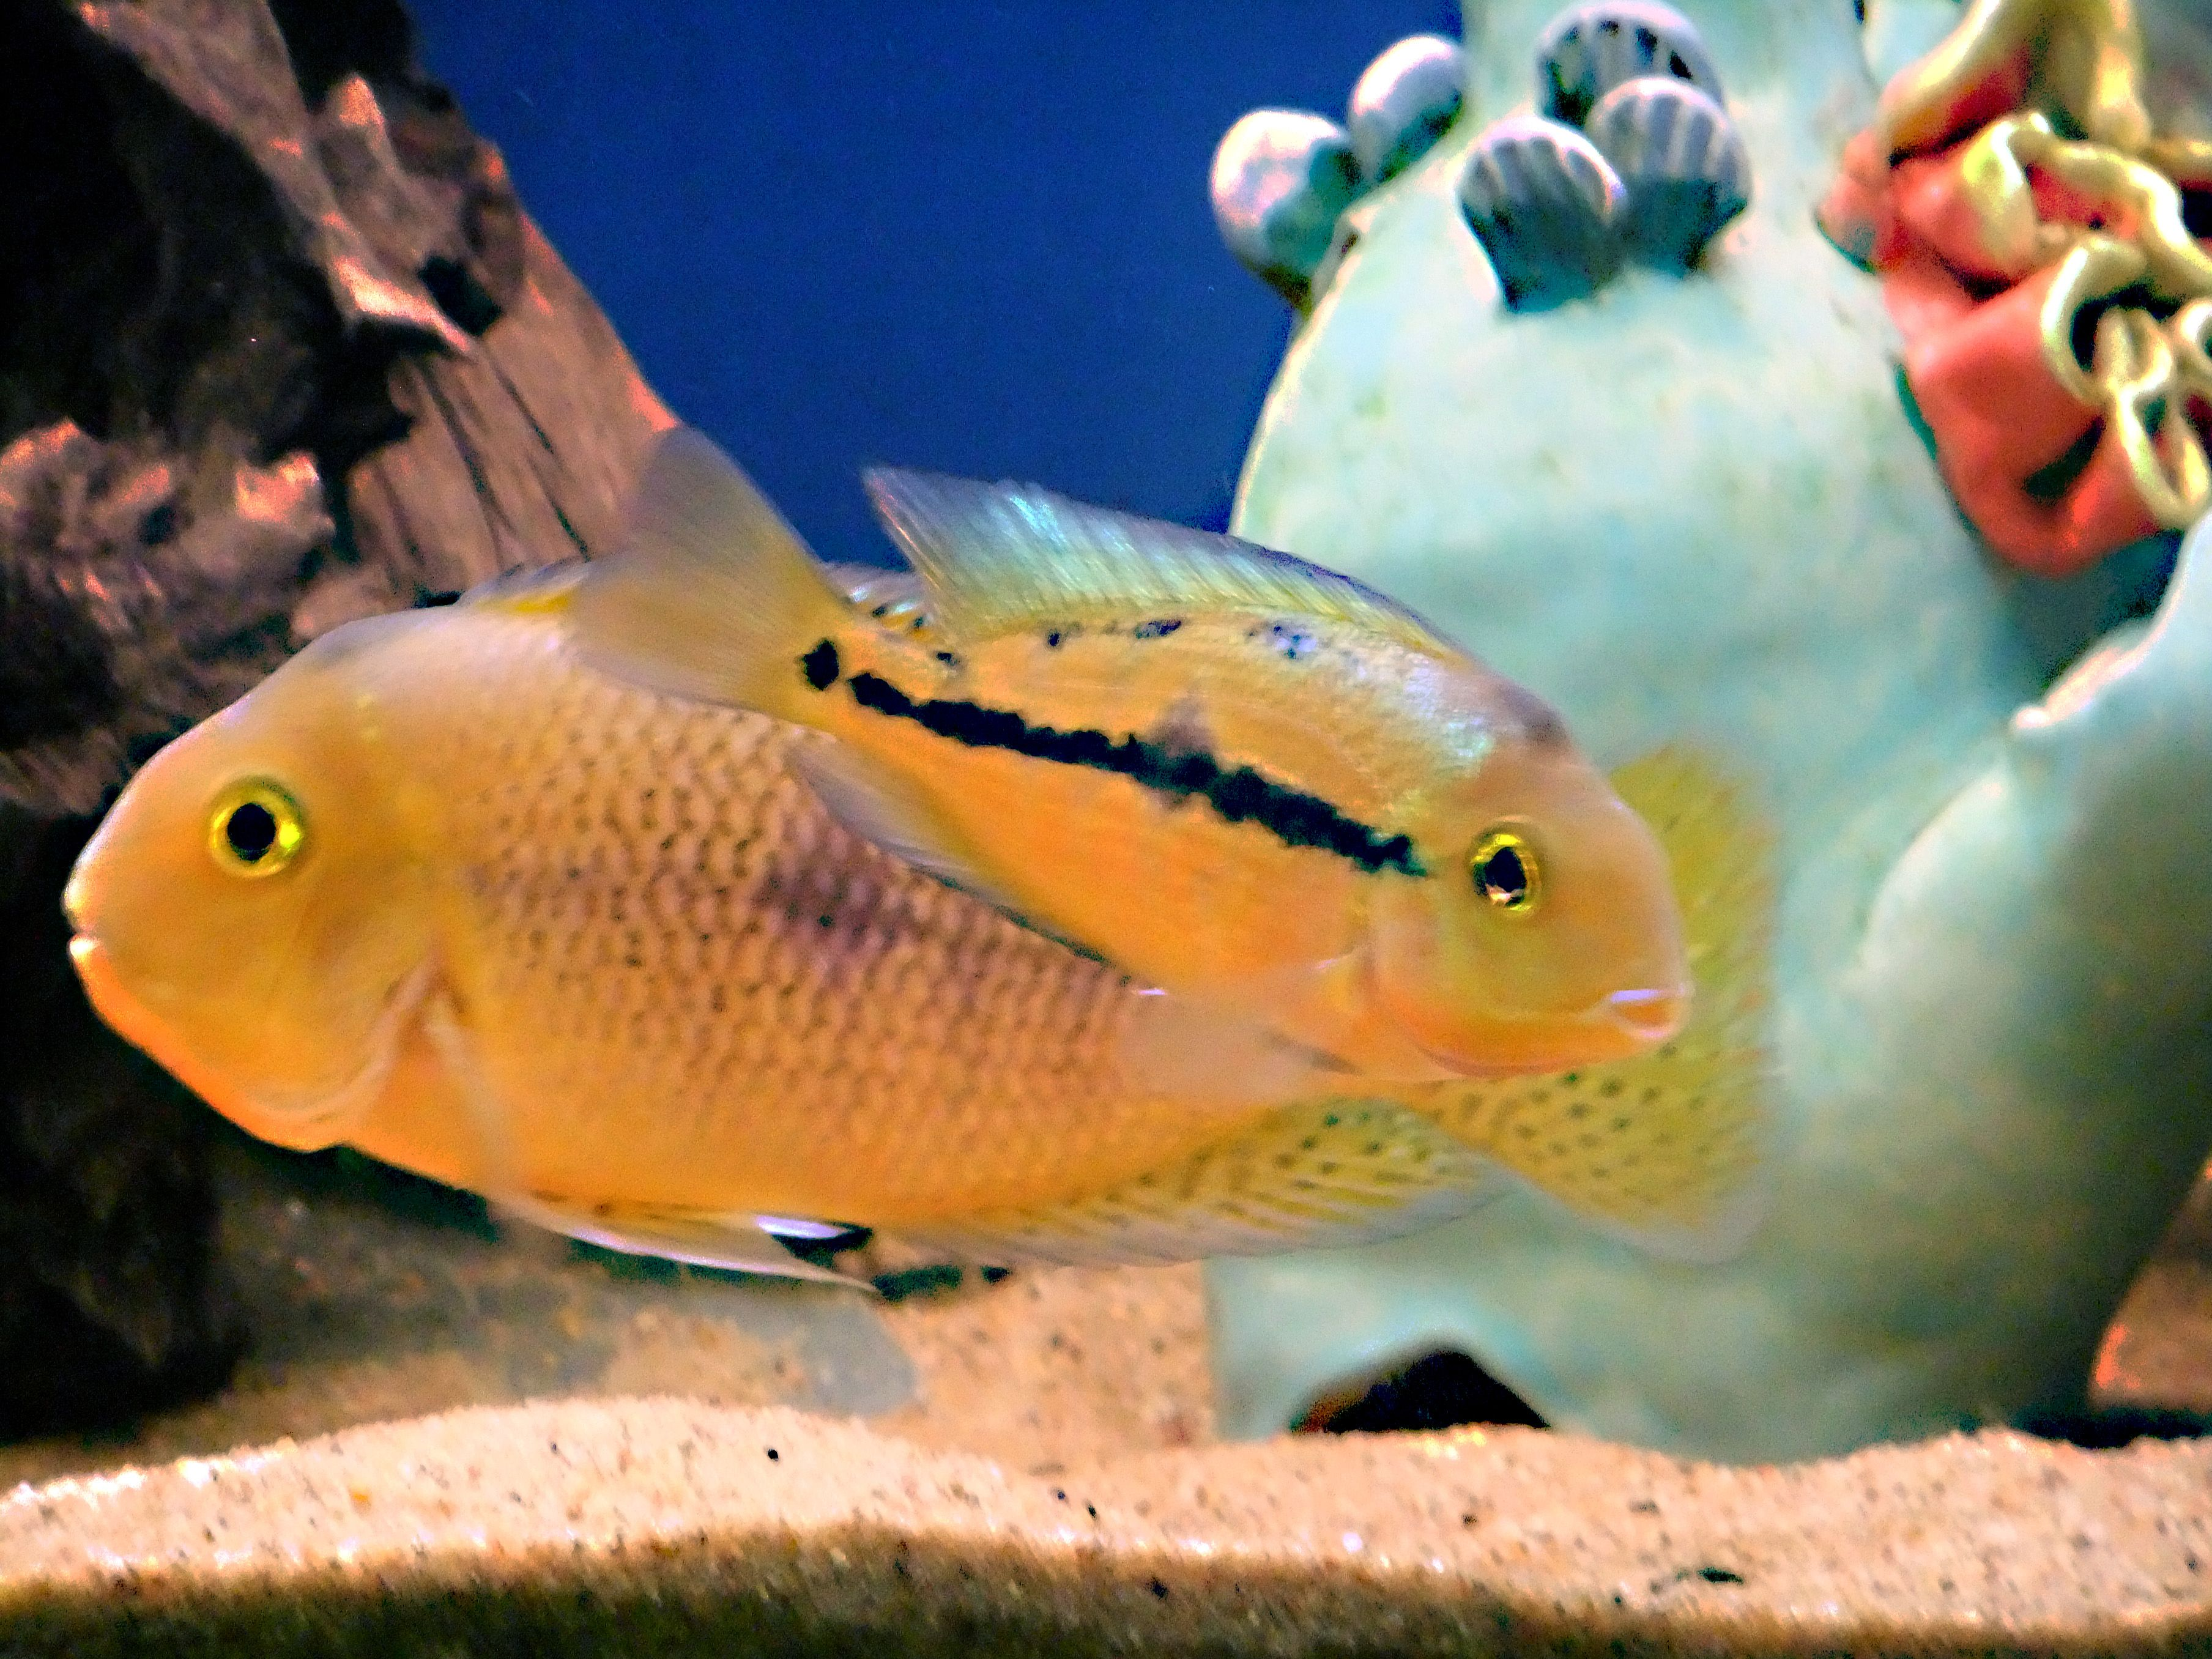 Freshwater aquarium fish documentary - Breeding Pair Of Nicaraguan Cichlids Nicaraguanaquarium Freshwateraquarium Fishbreeding